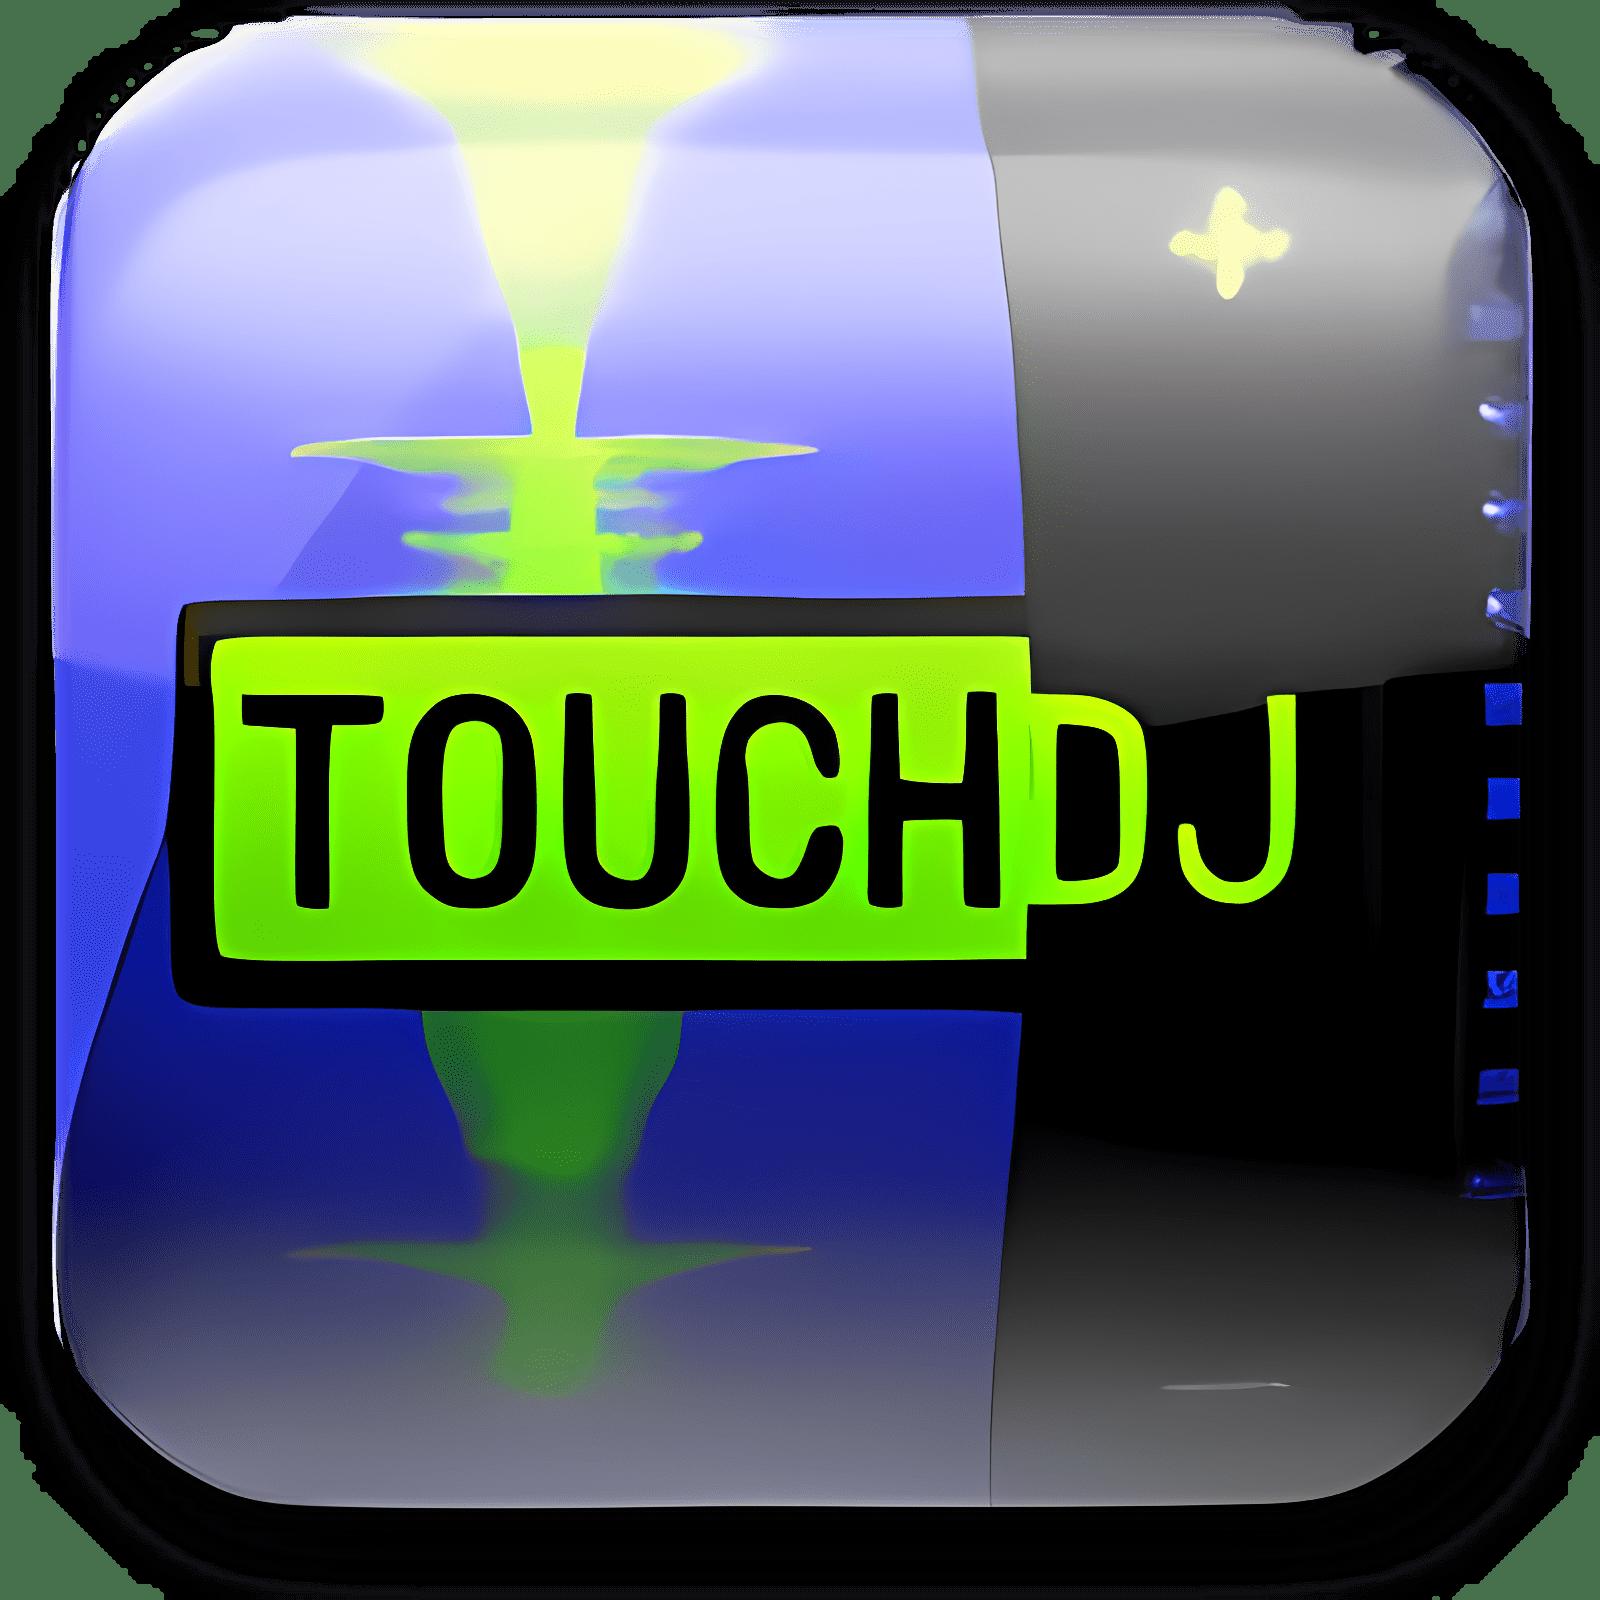 Touch DJ 2.3.1